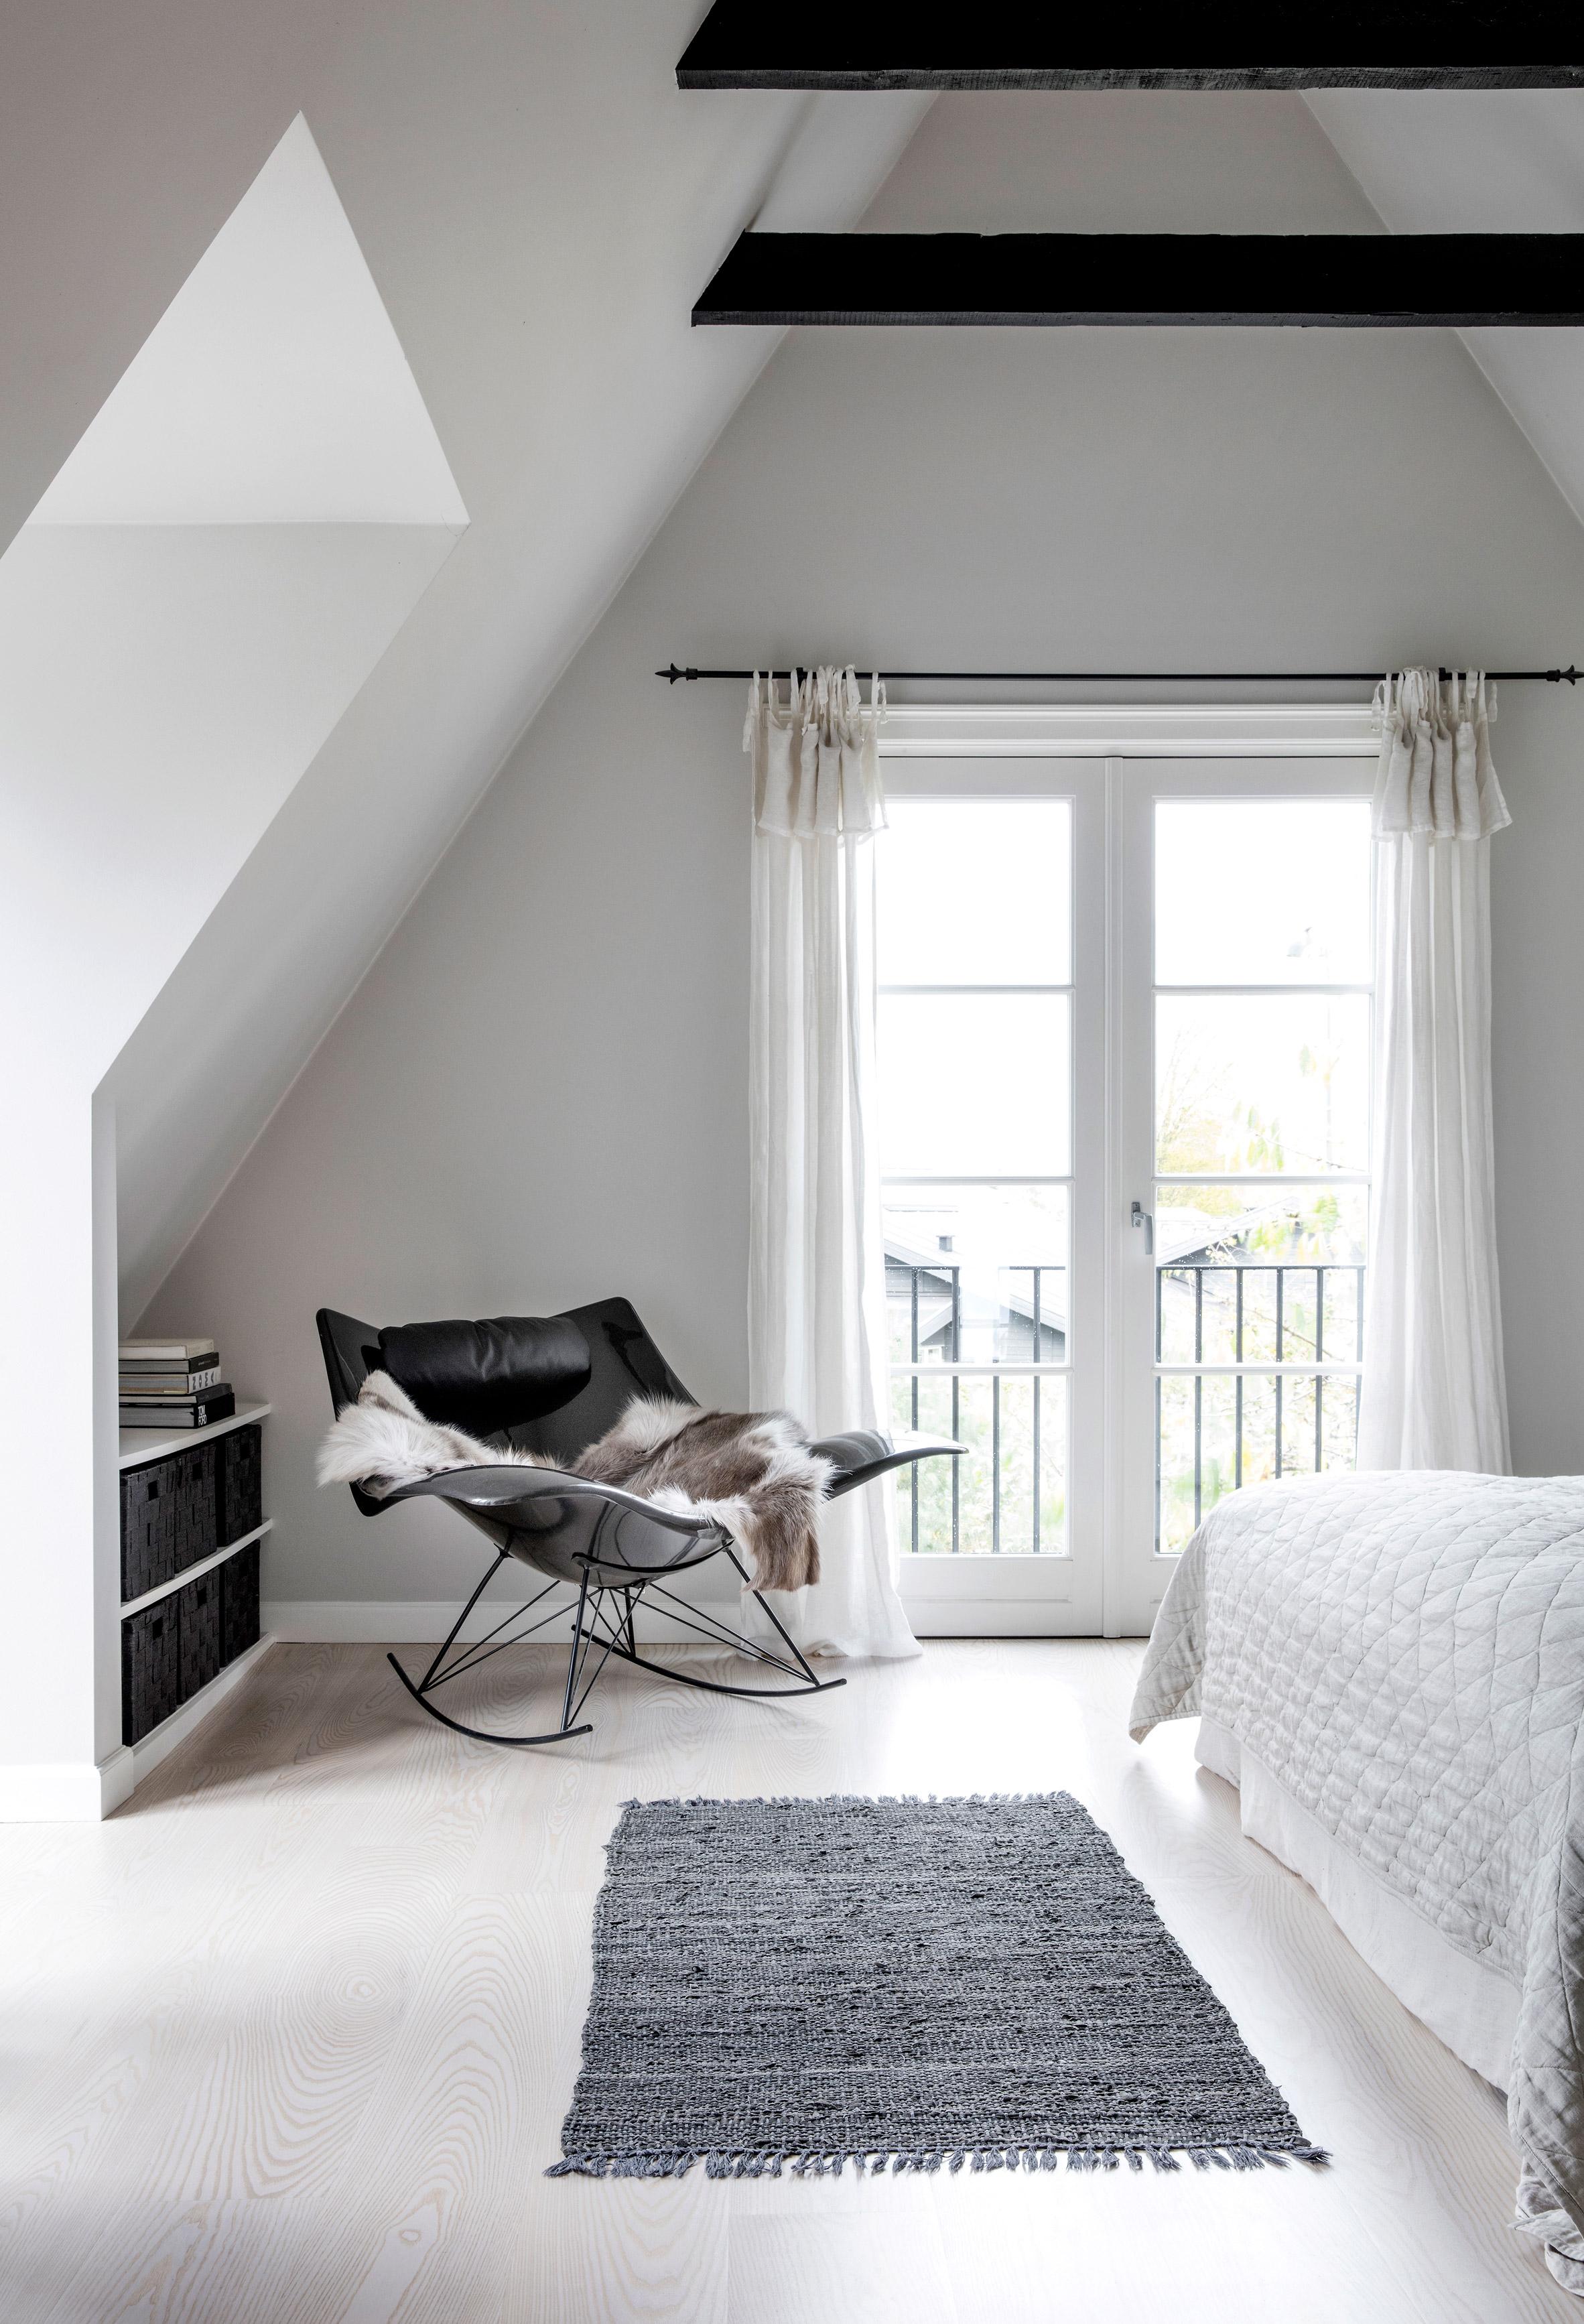 elledecoration vn nhà màu trung tính kaja-moller-home-fredericia-interiors-residential-copenhagen 6